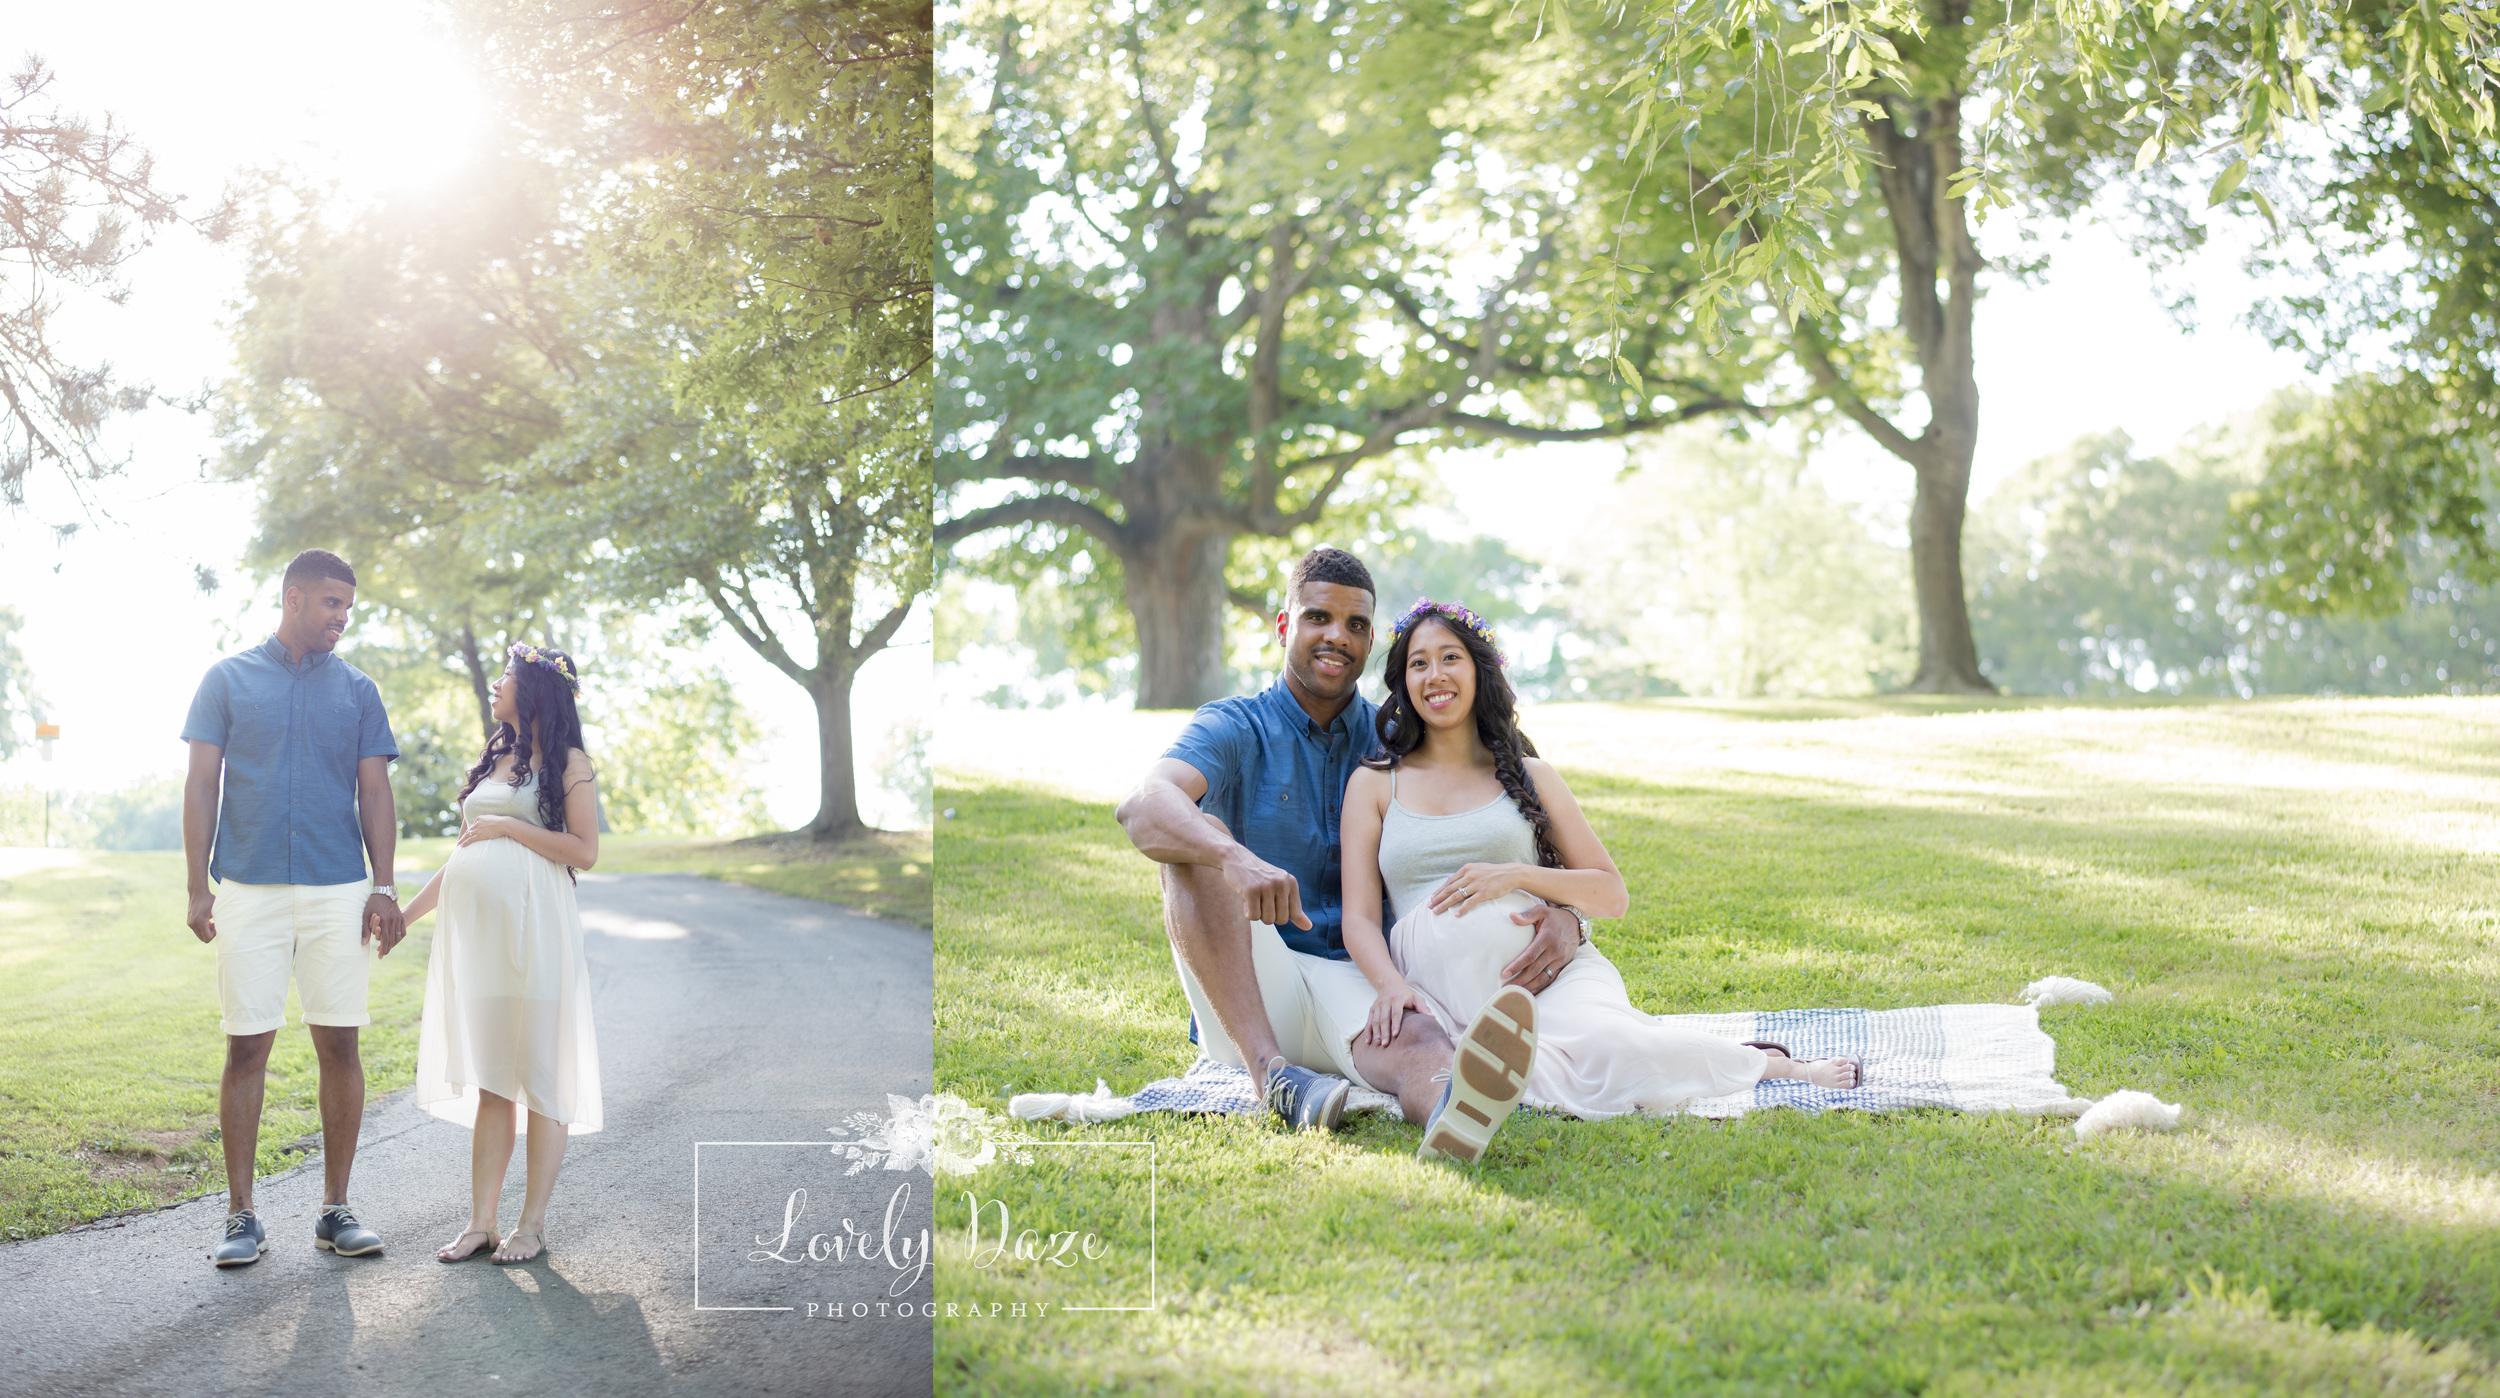 nj maternity photographer1.jpg